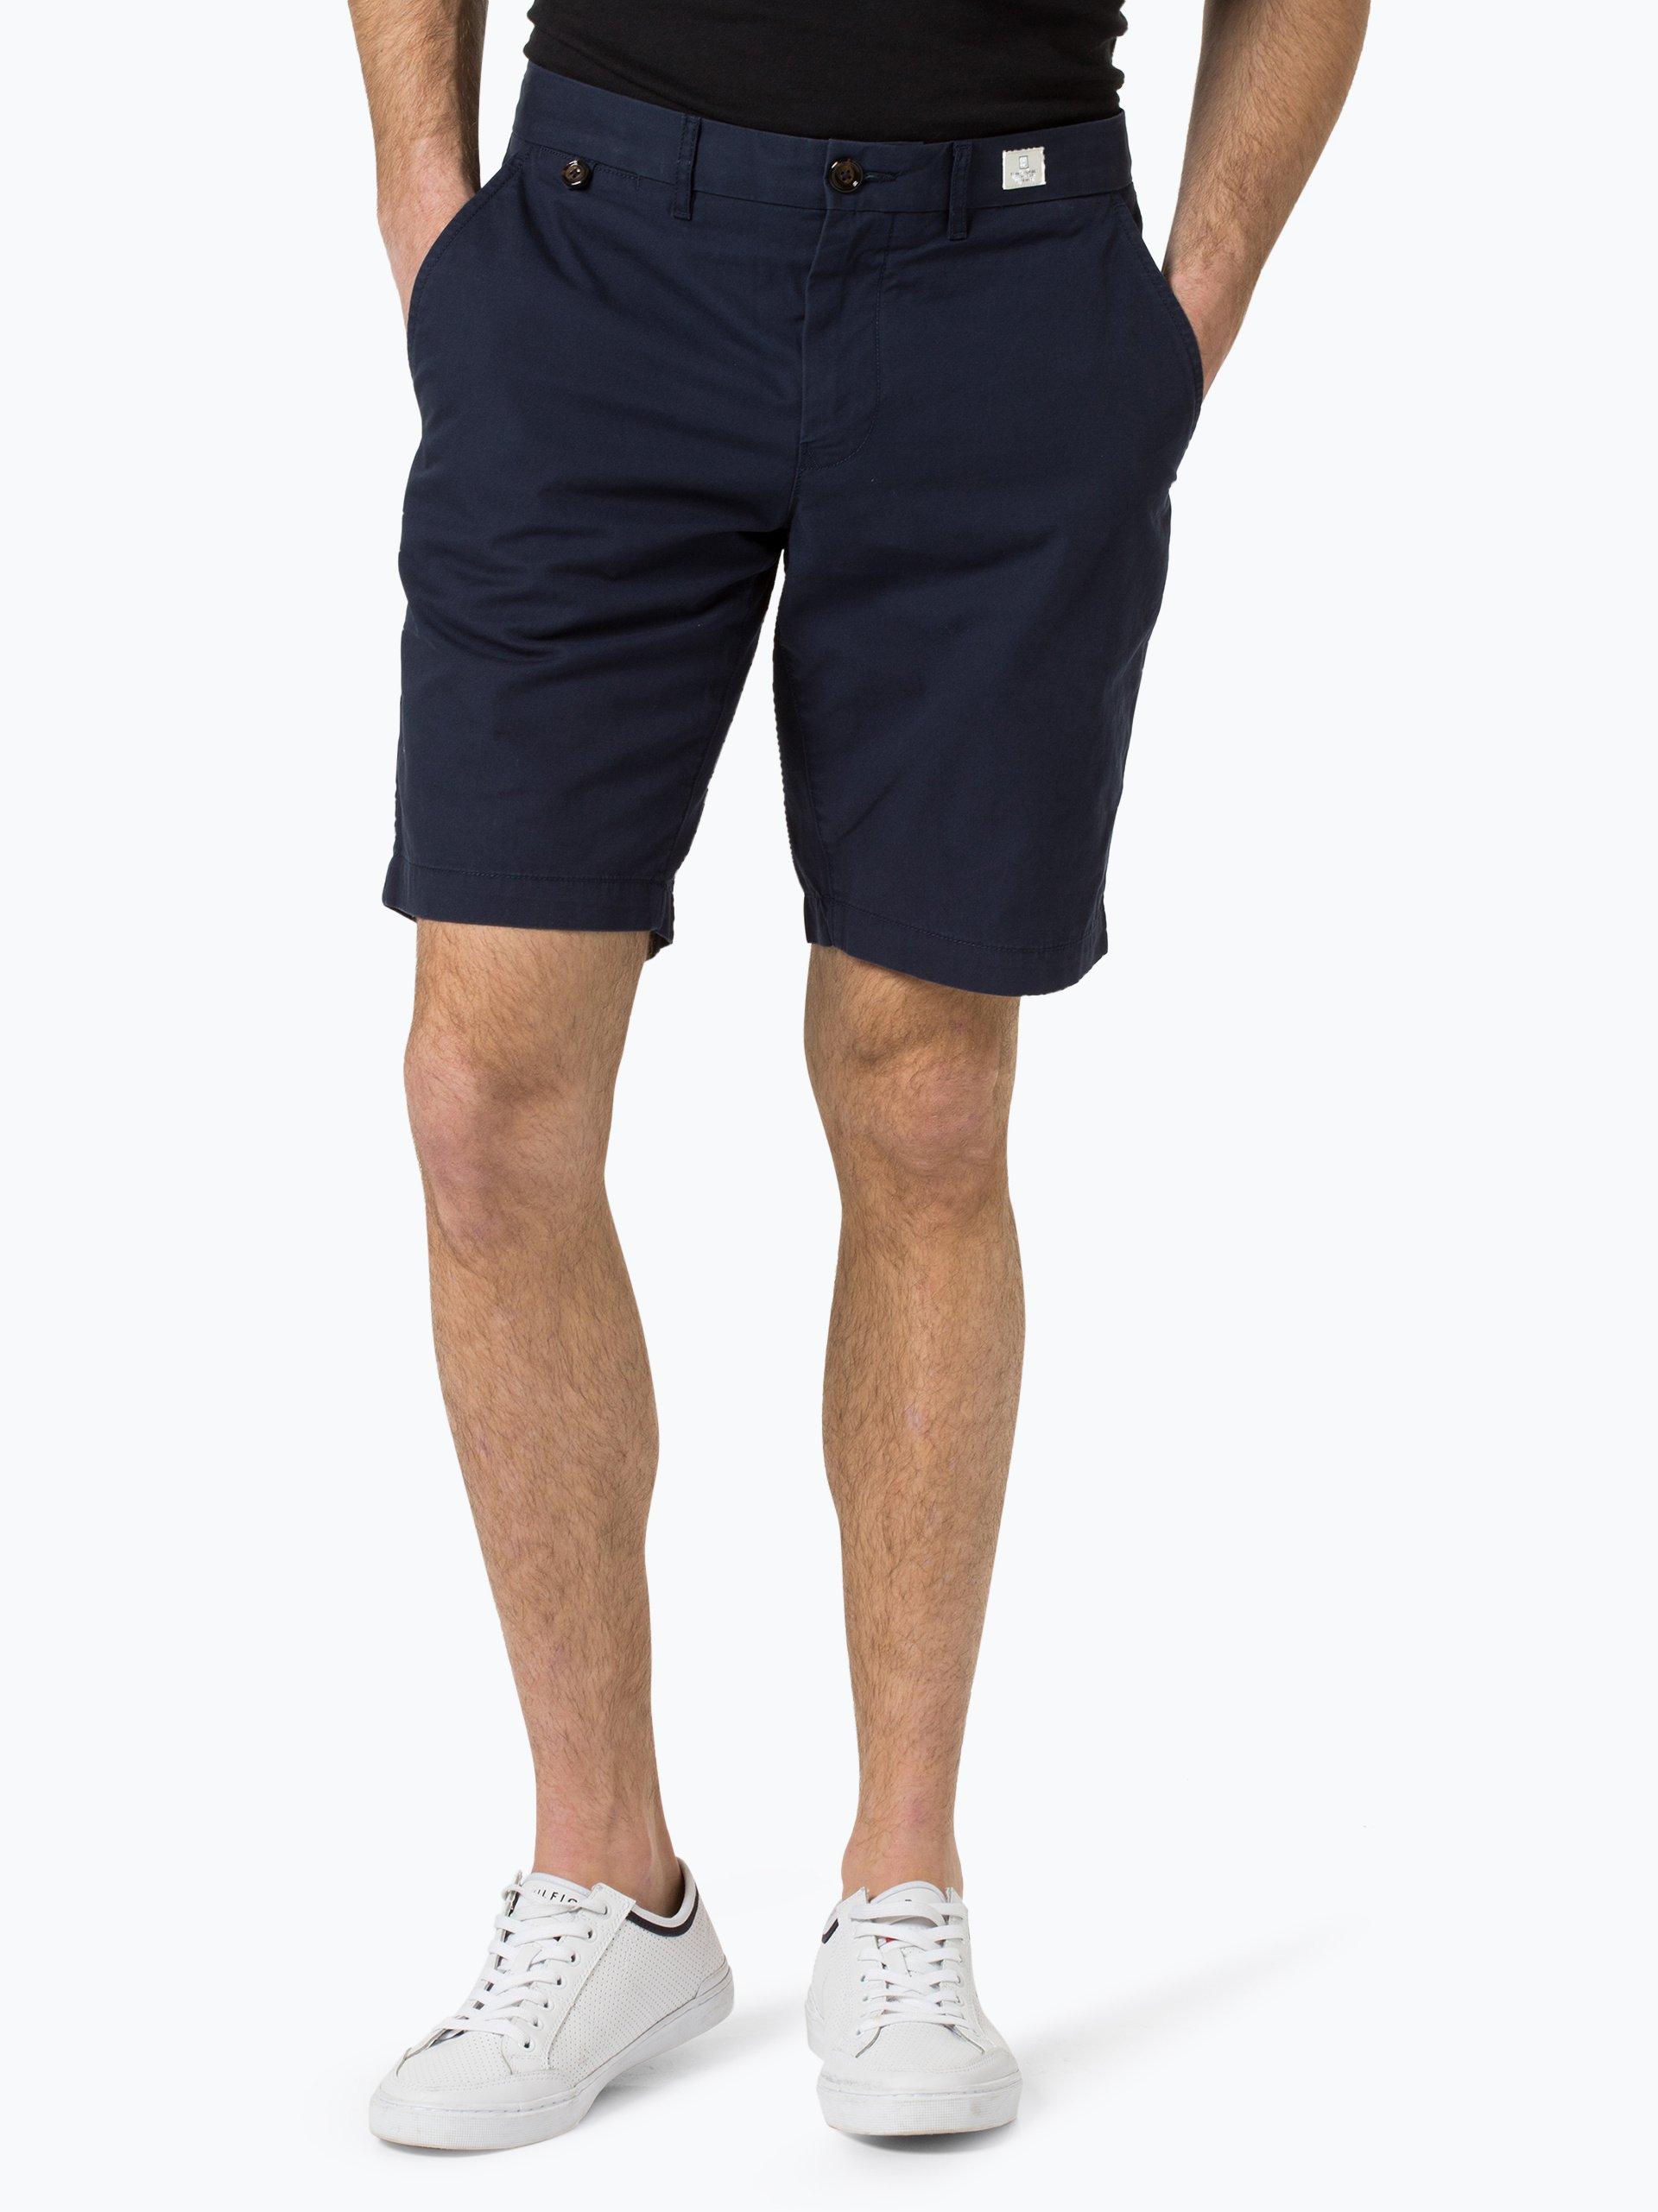 tommy hilfiger herren shorts marine uni online kaufen. Black Bedroom Furniture Sets. Home Design Ideas